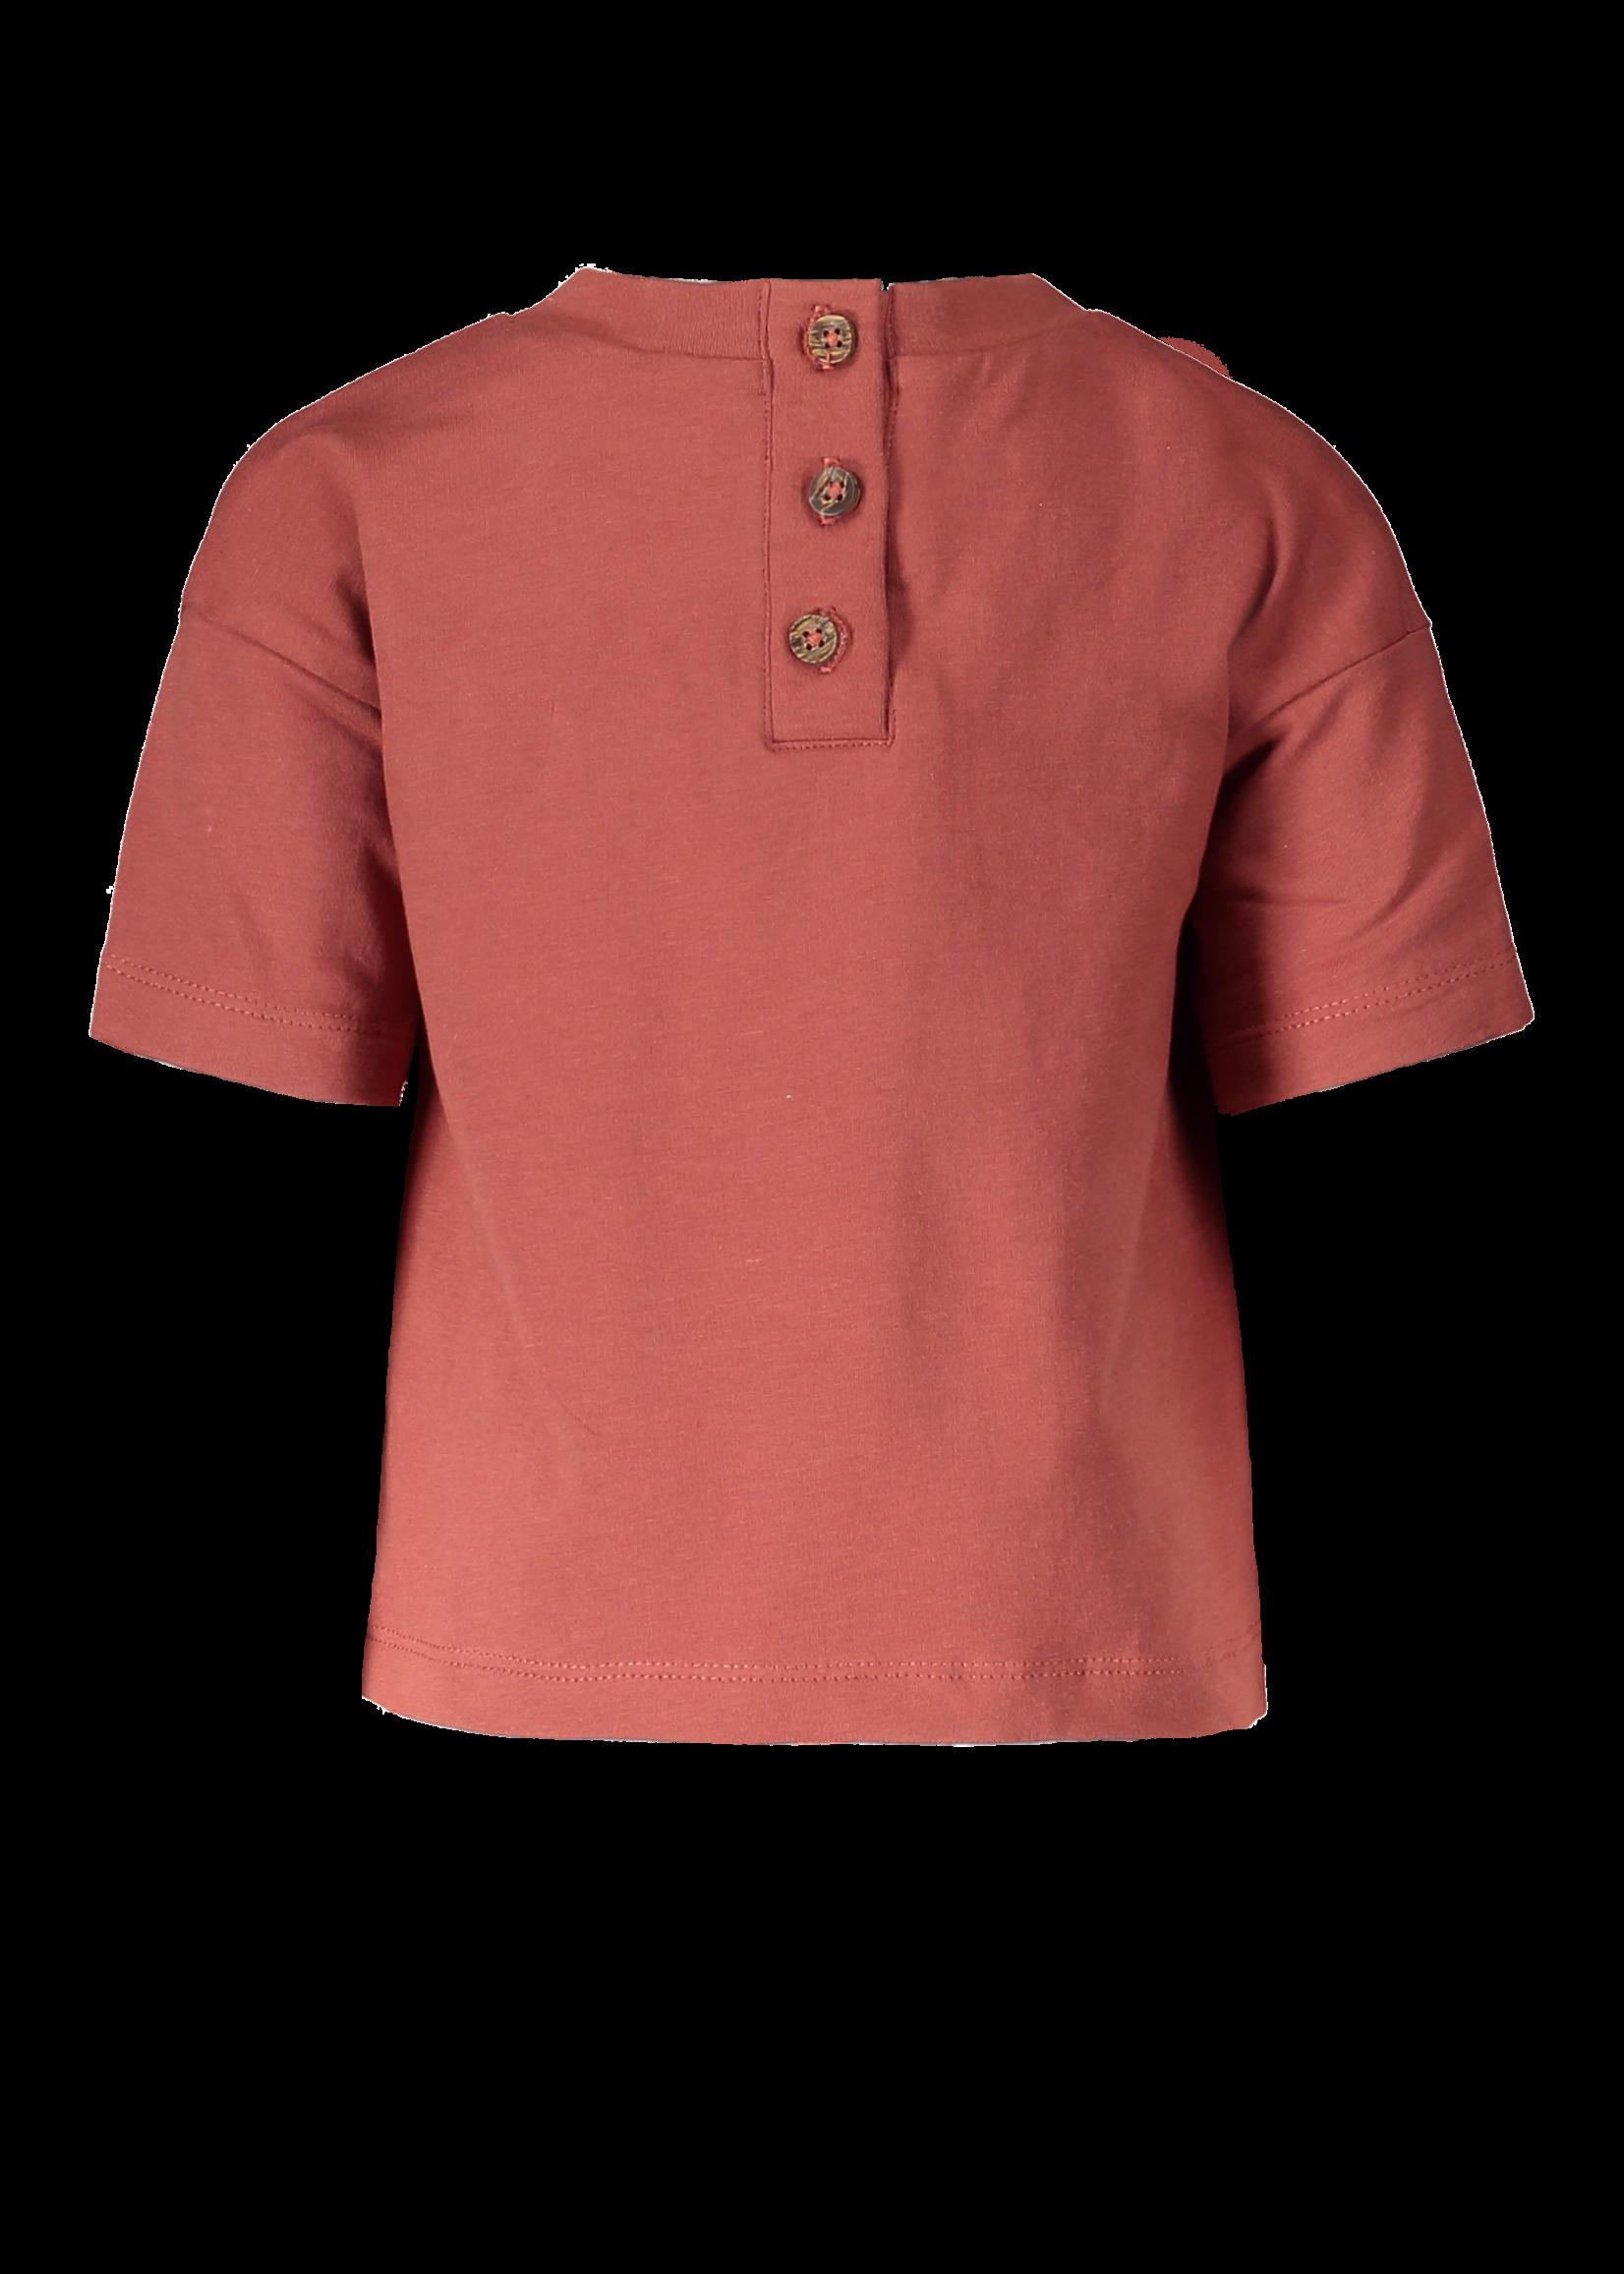 Pexi Lexi PL - T-Shirt - Marsala